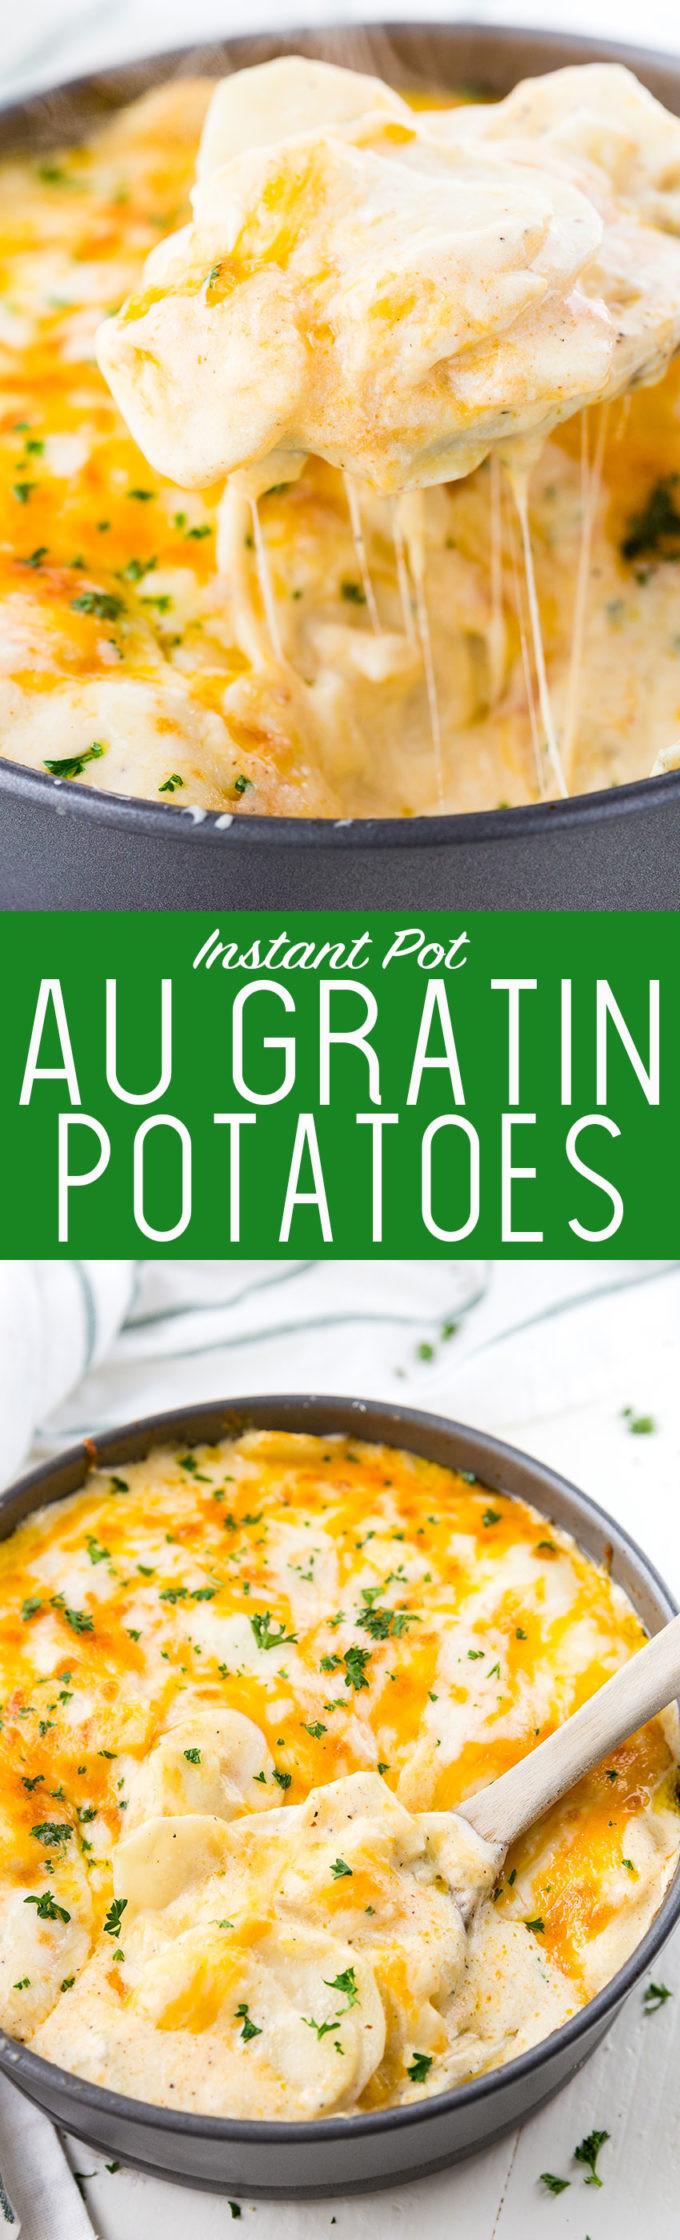 Instant Pot Scalloped Potatoes  Instant Pot Au Gratin Potatoes Easy Peasy Meals